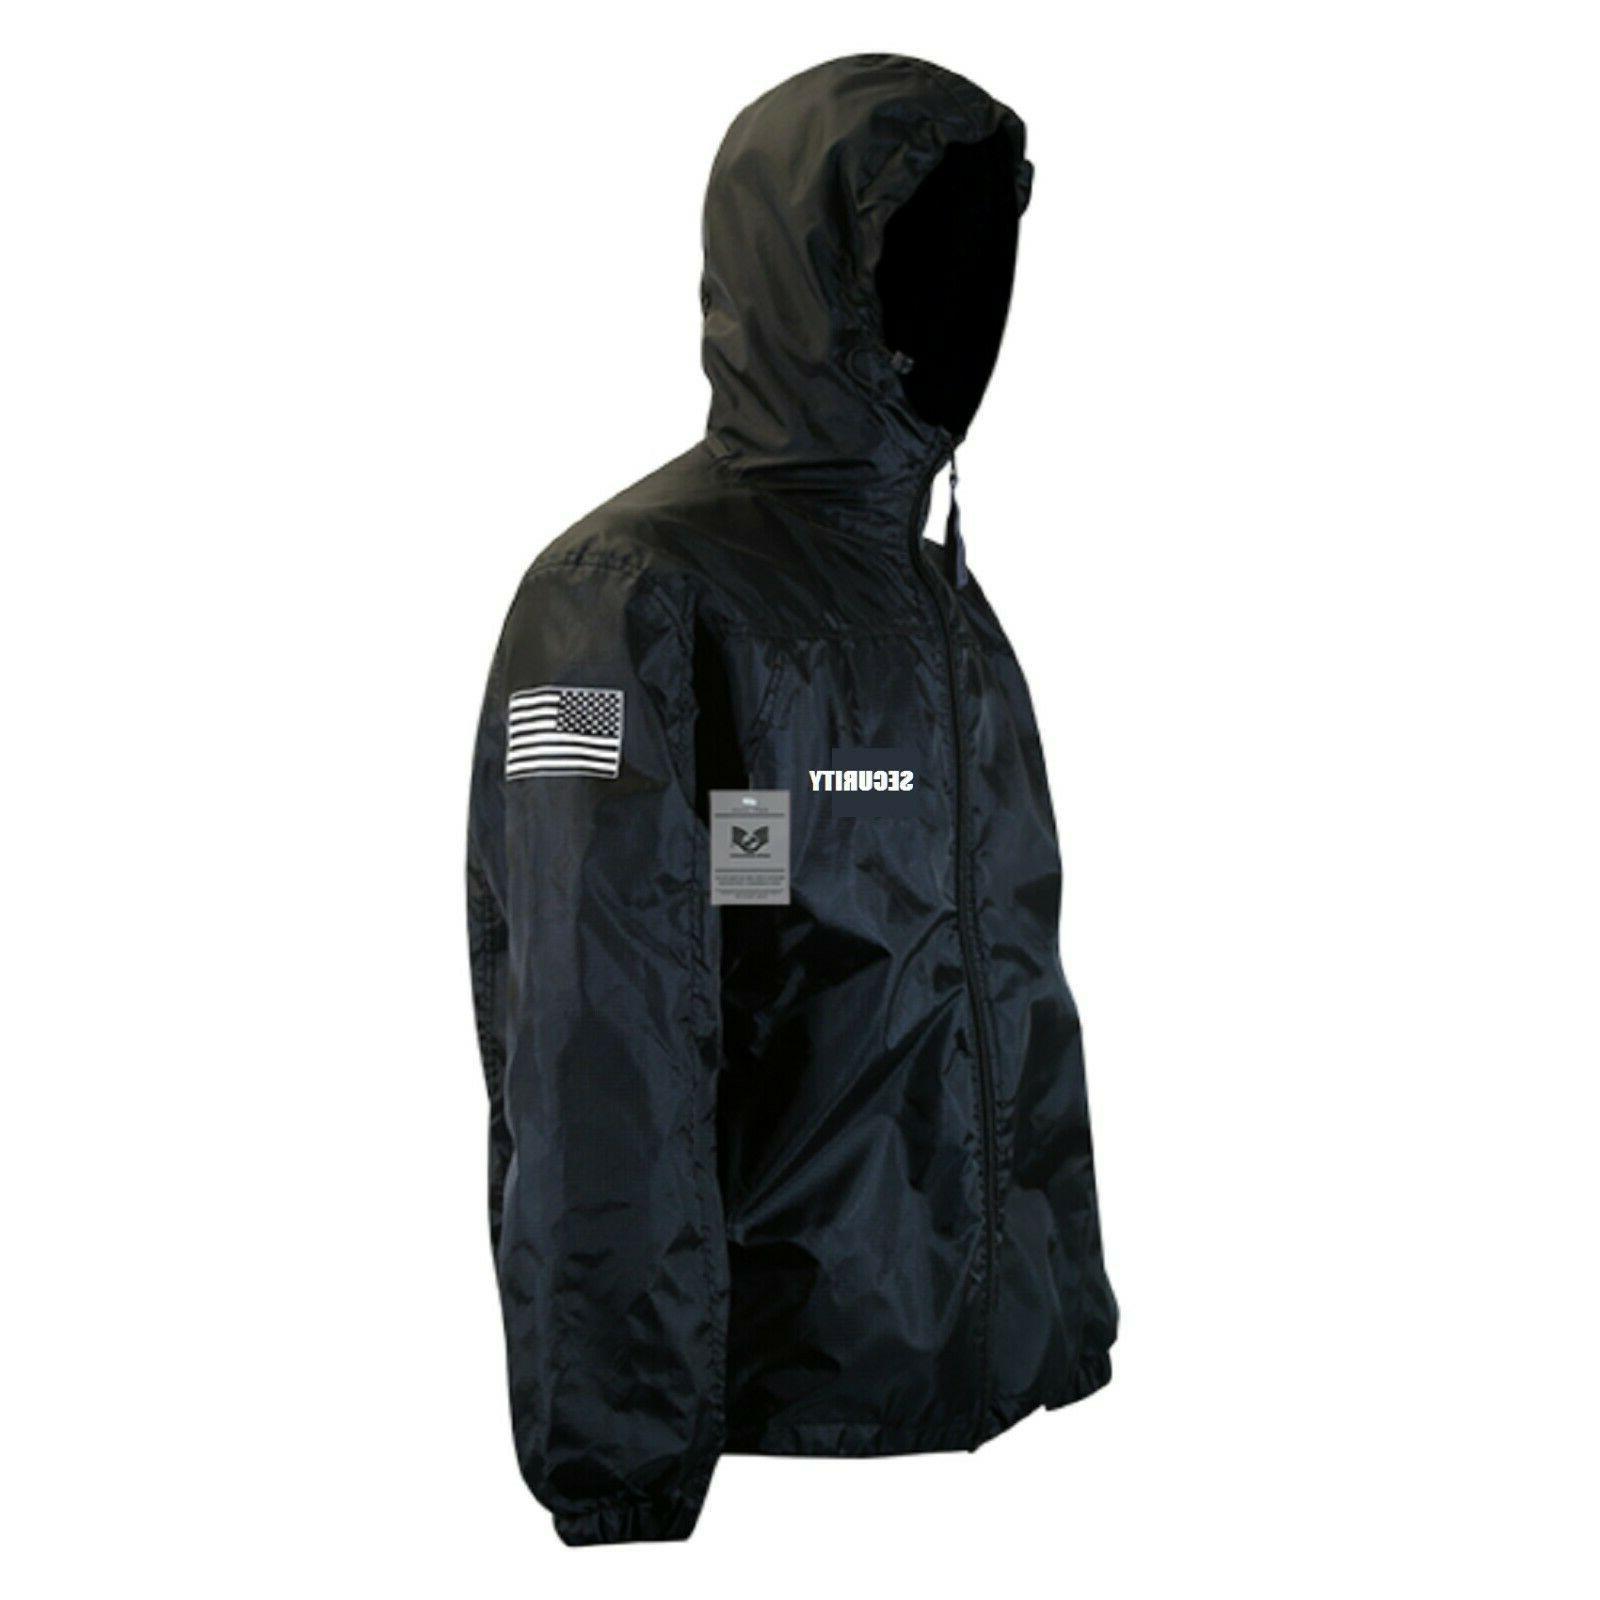 Black Guard Windbreaker Zipper Jacket USA